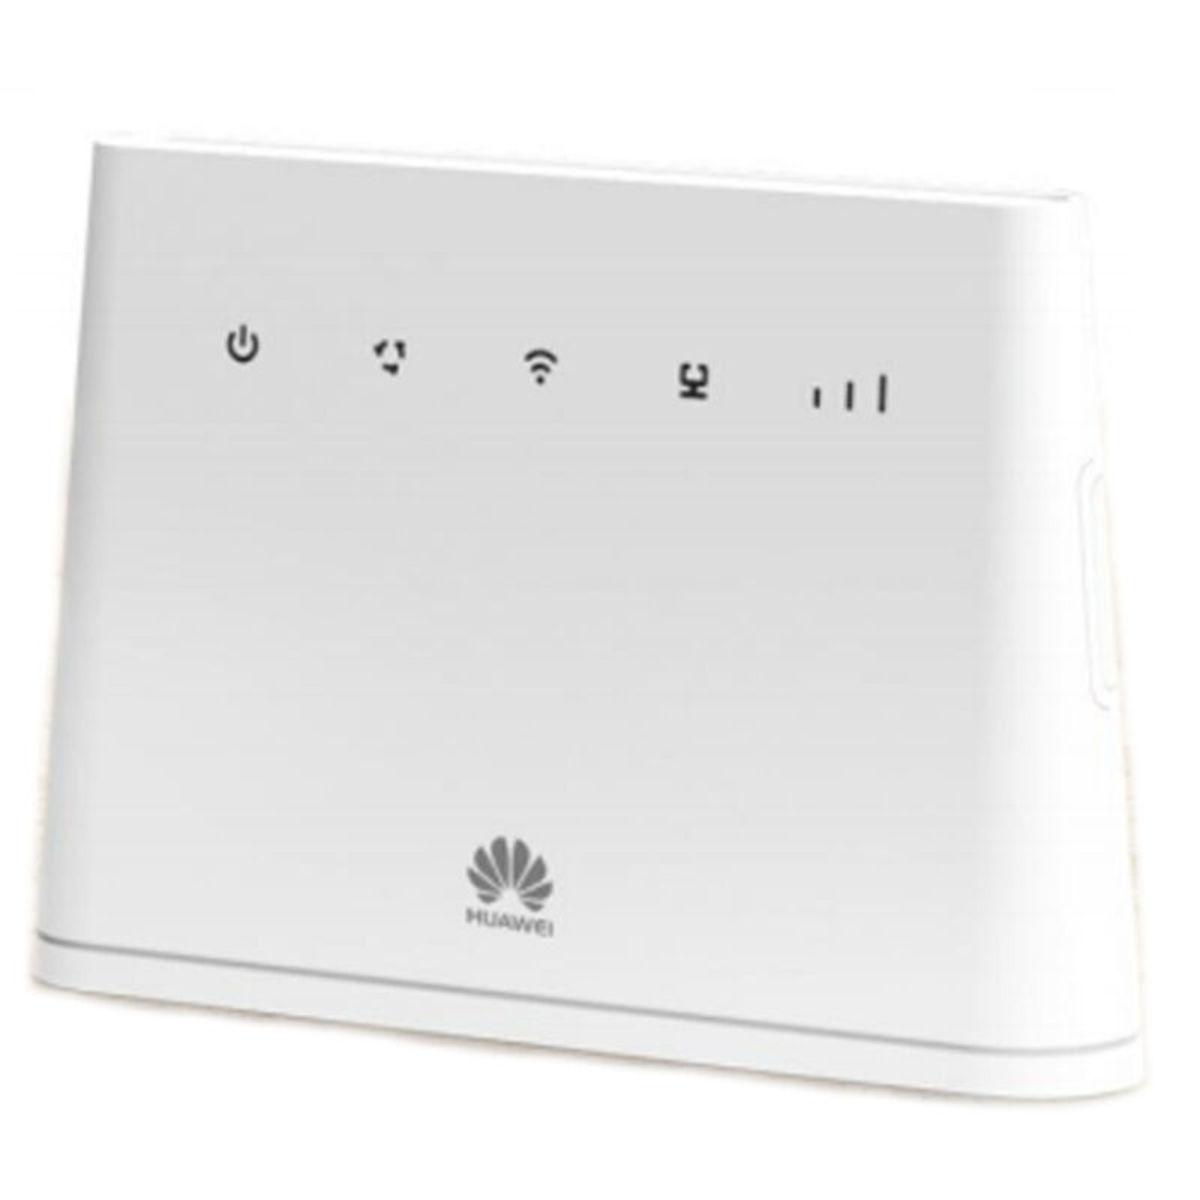 4G SIM卡 300M WIFI無線路由器 B310As